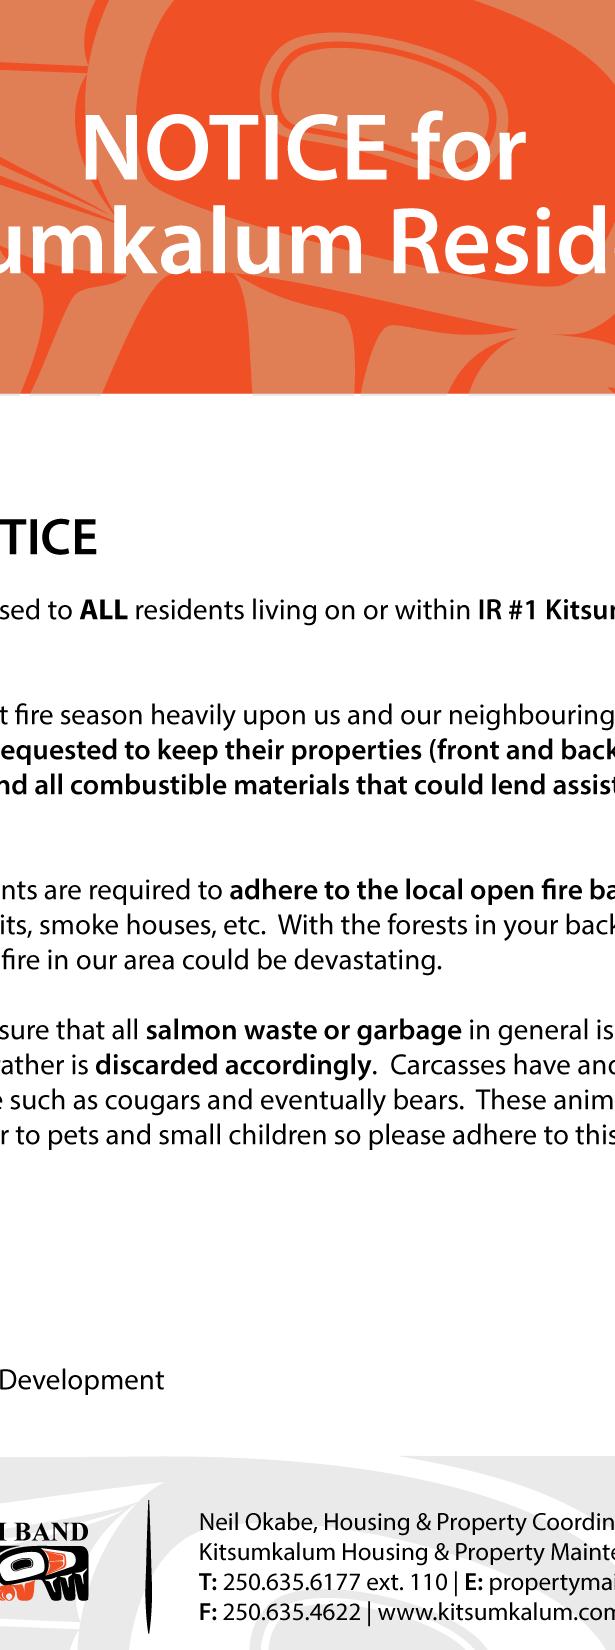 Housing & Property Maintenance | Kitsumkalum, a Galts'ap